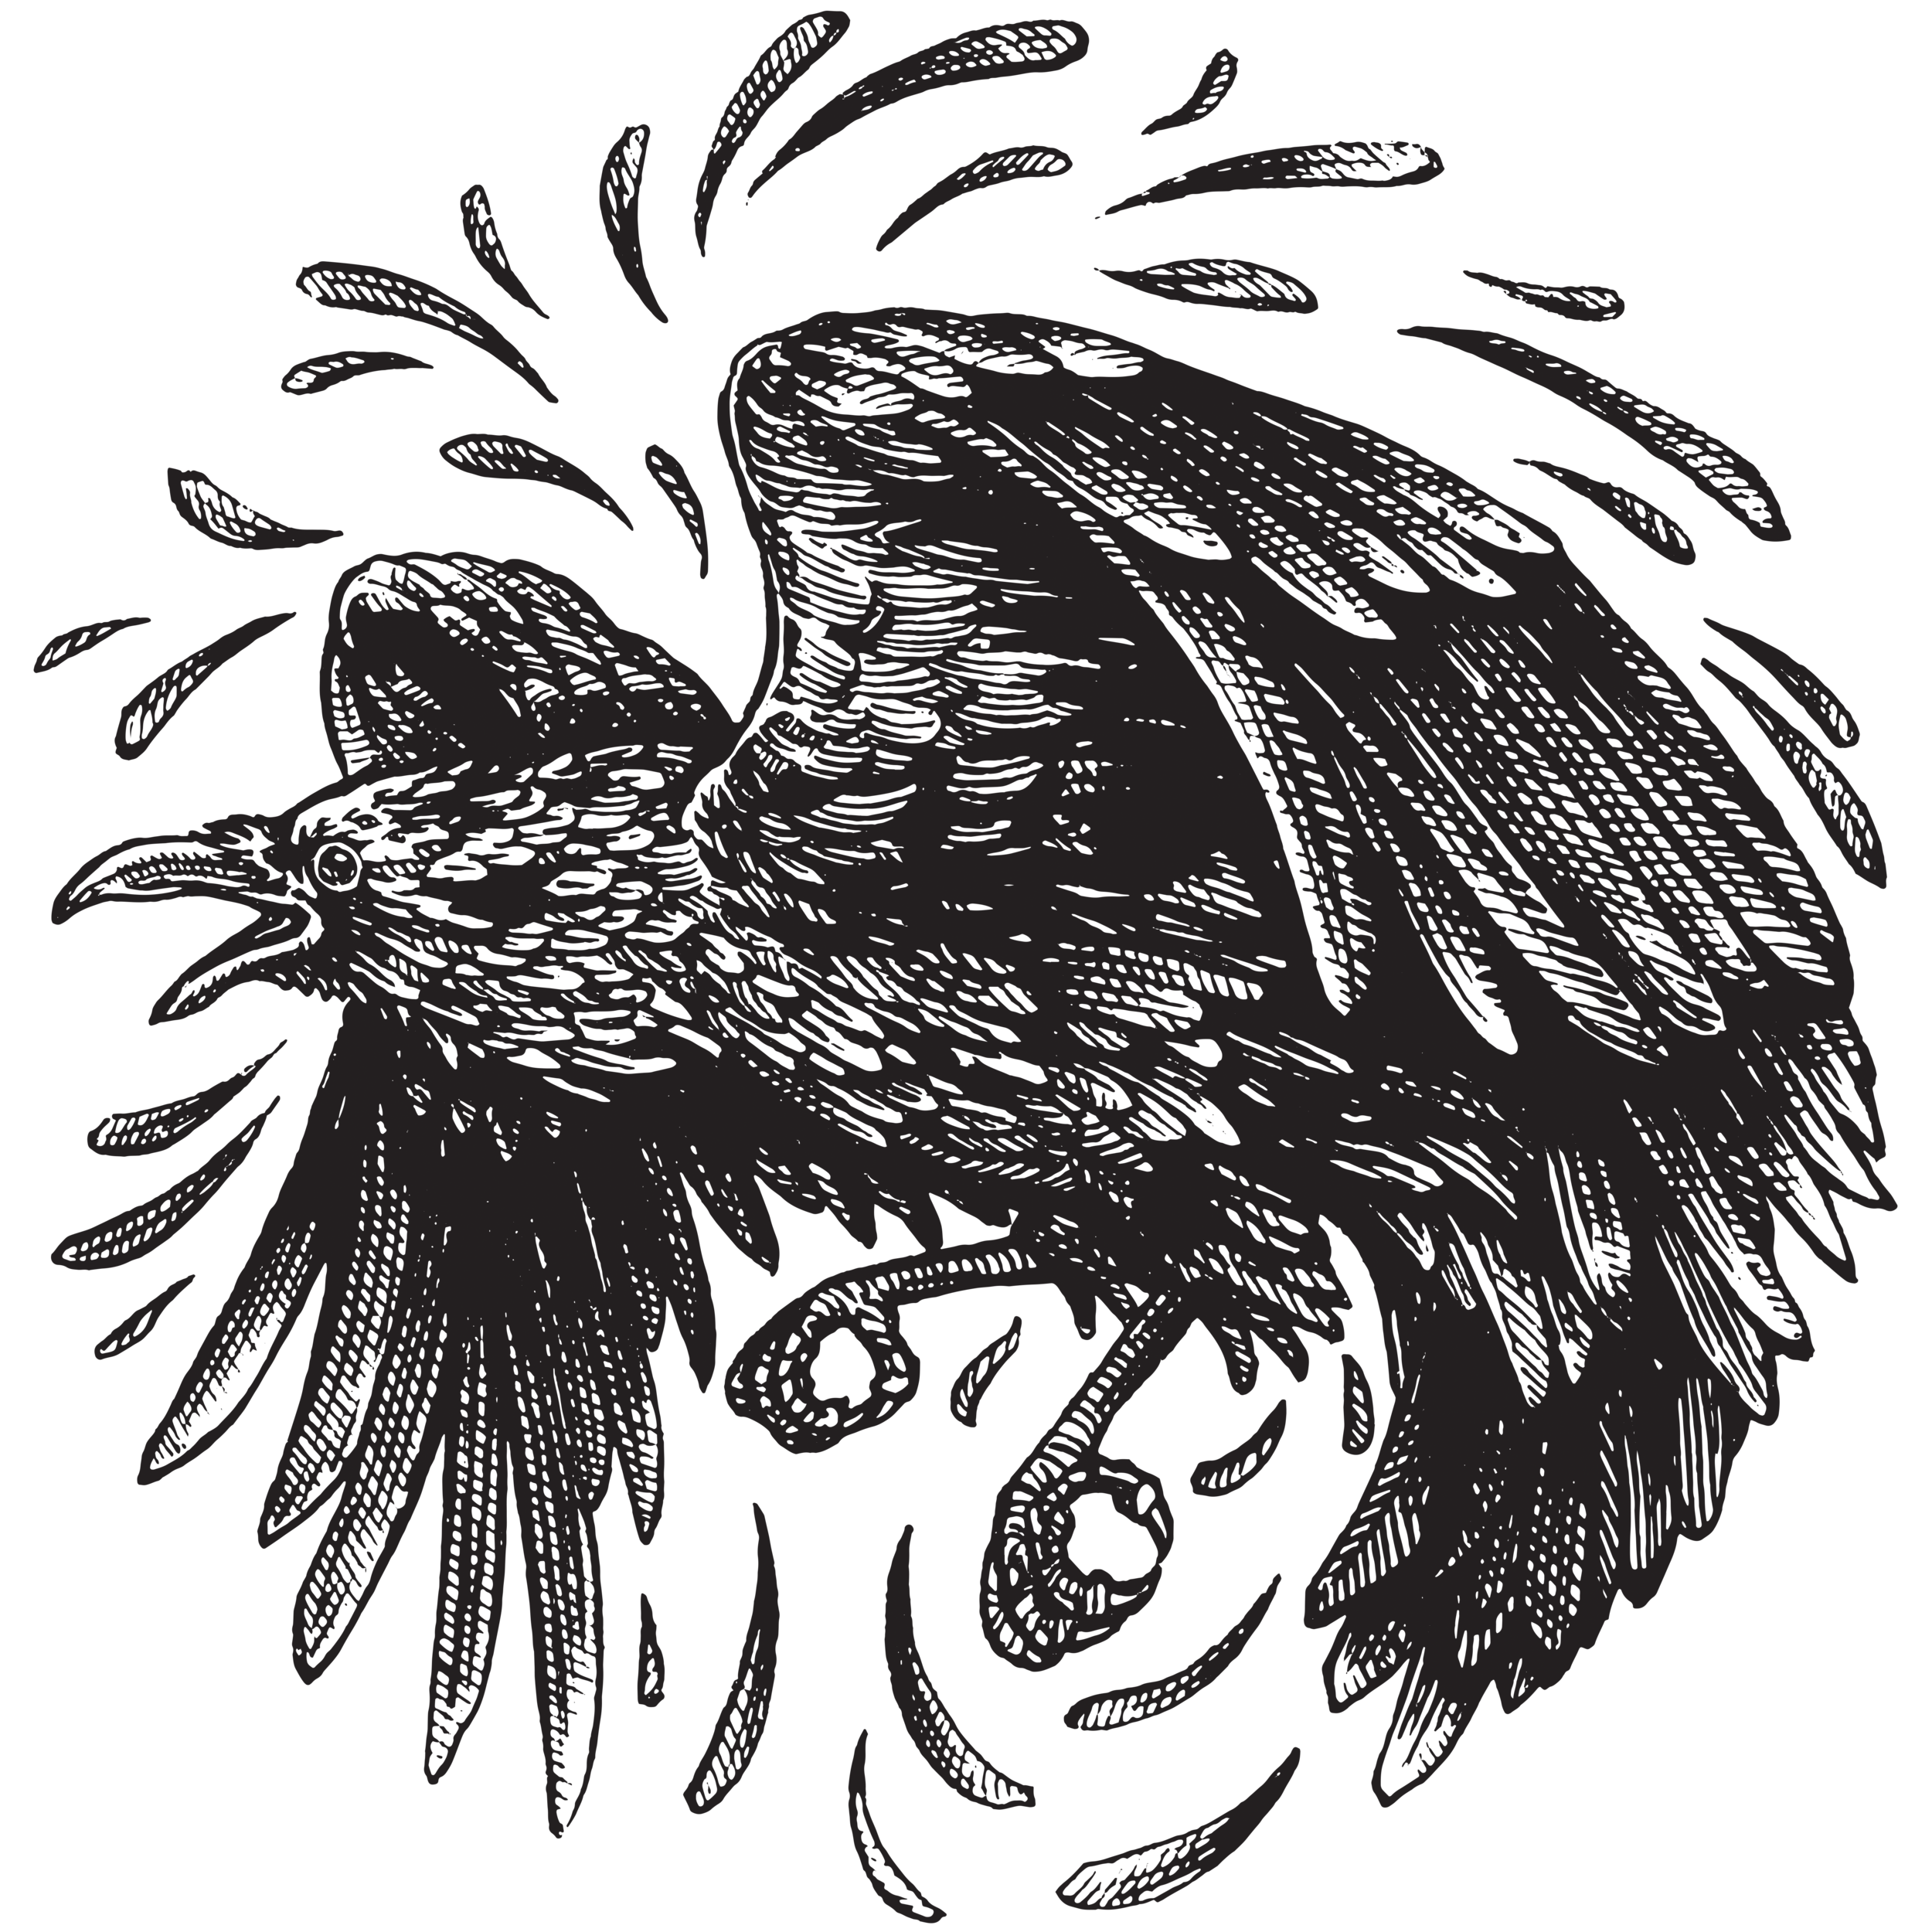 Redbubble-Raven.png